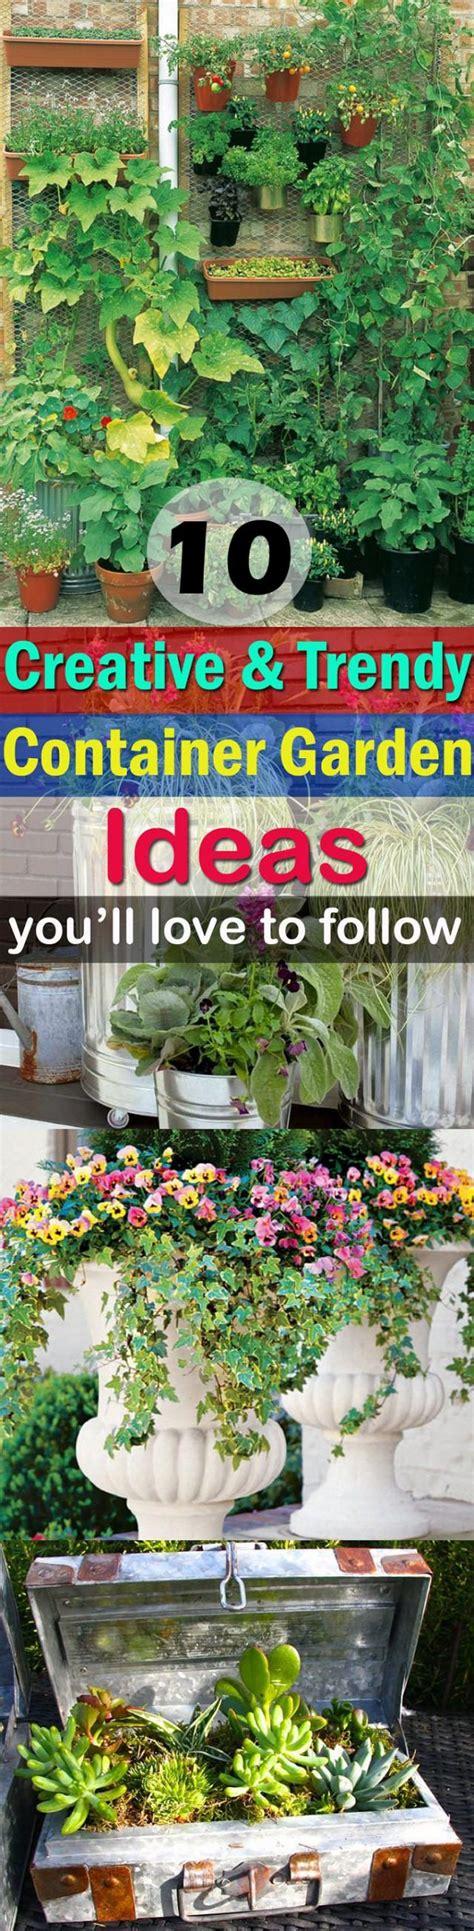 Creative Container Gardening Ideas 10 Creative And Trendy Container Garden Ideas You Ll To Follow Gardening Viral